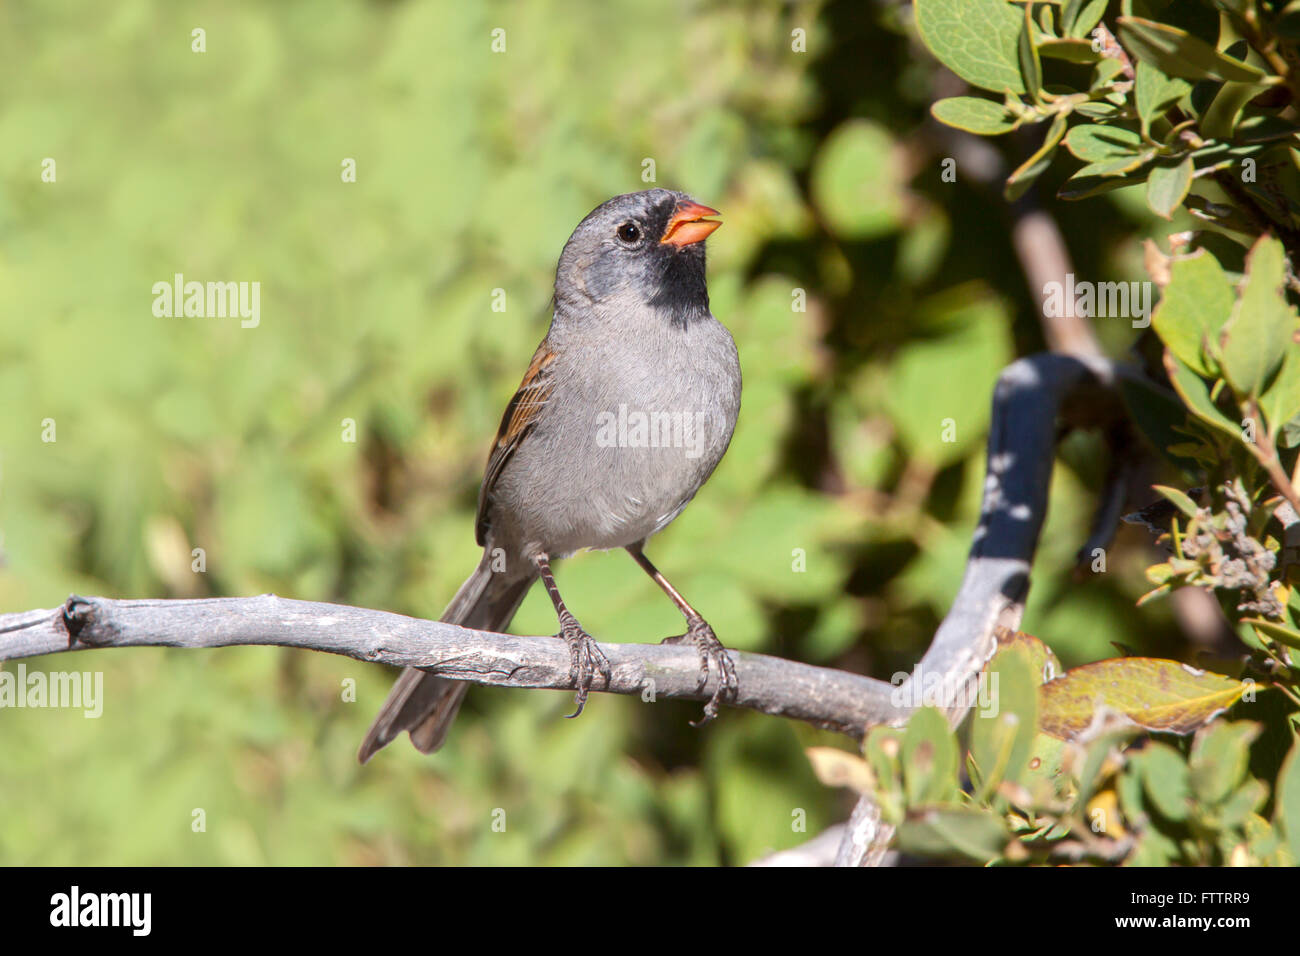 Black-chinned Sparrow  Spizella atrogularis Santa Catalina Mountains, Pinal County, Arizona, United States 18 March - Stock Image